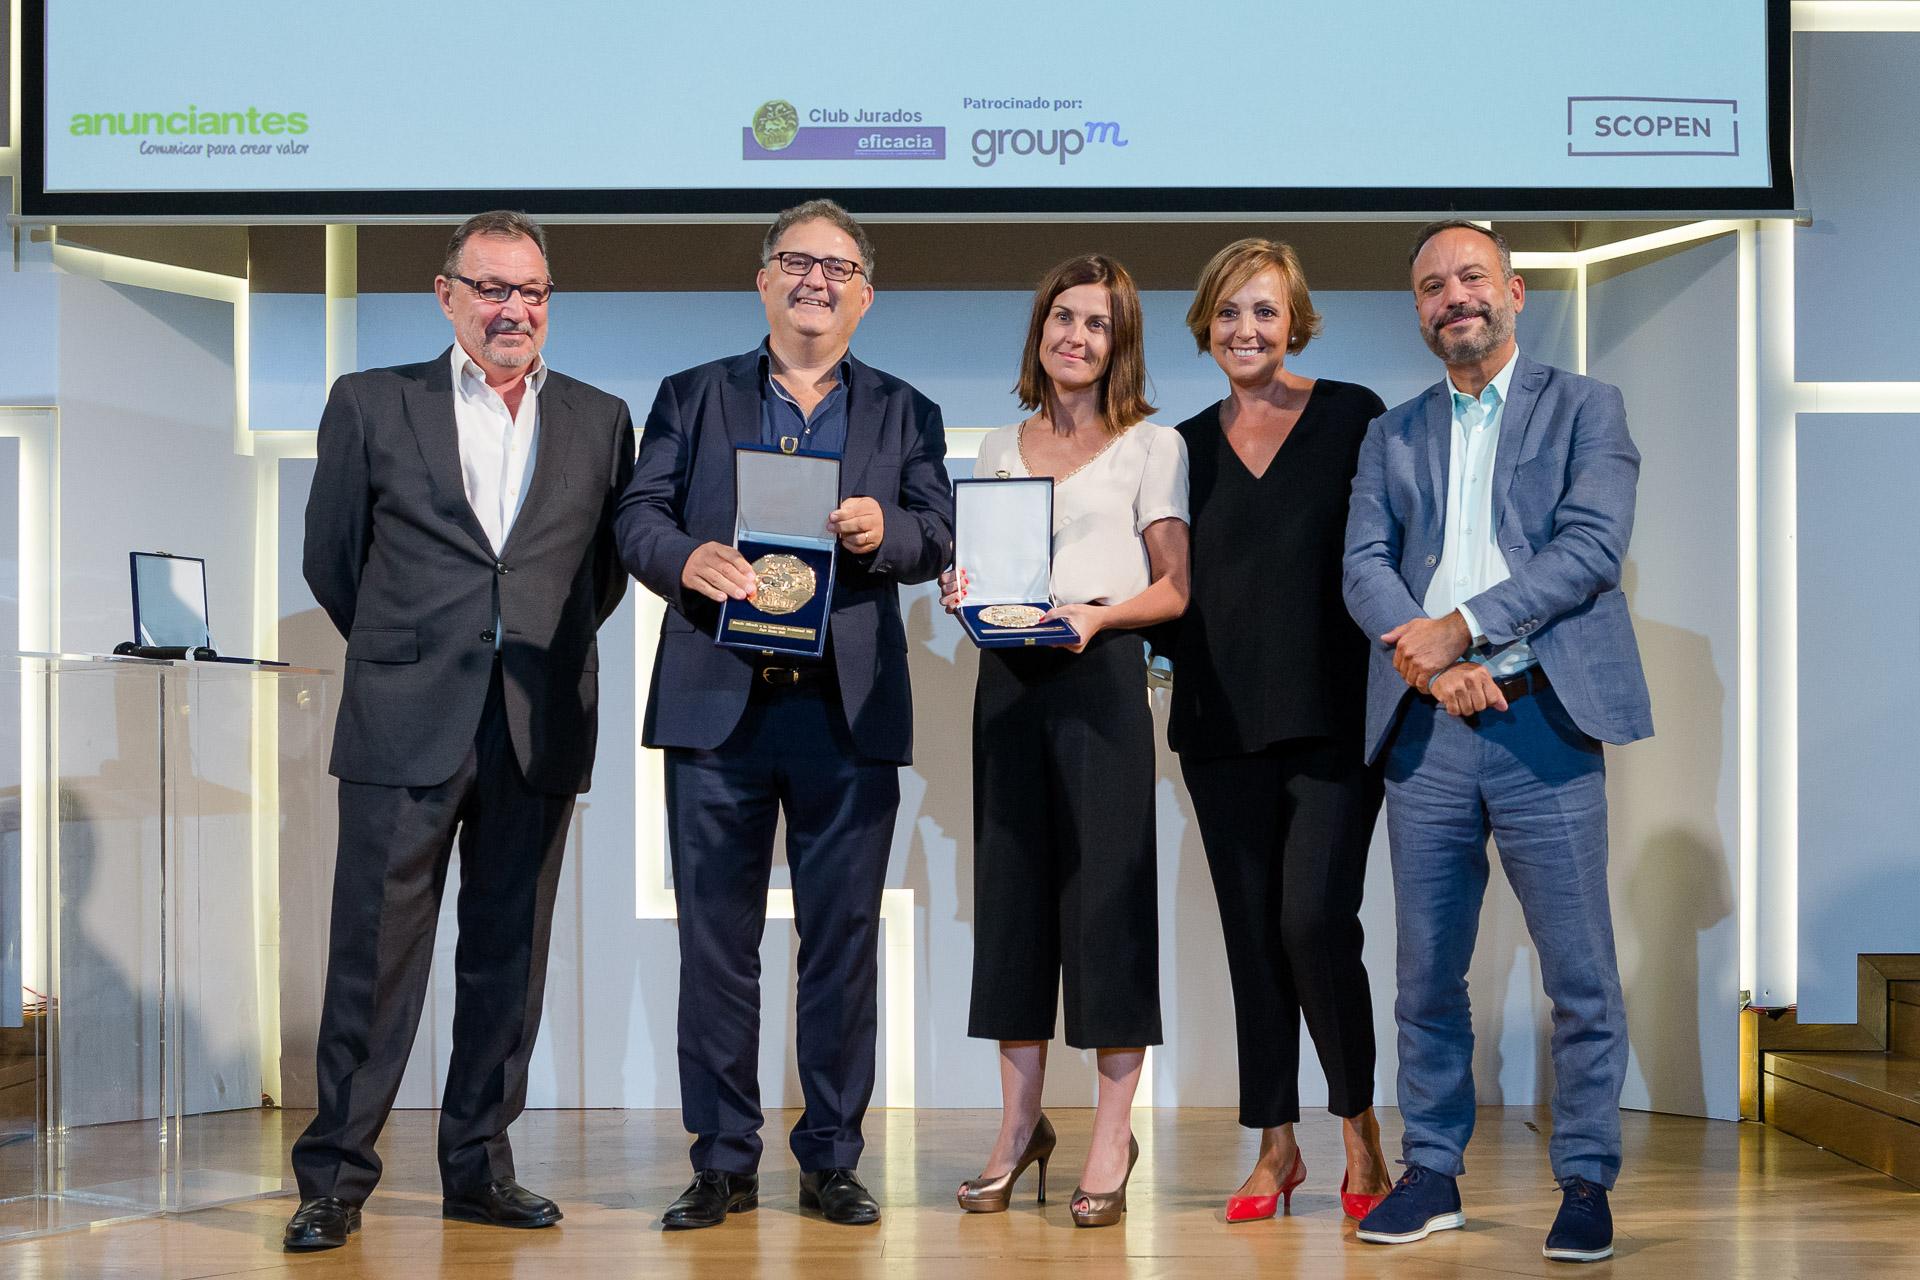 Premio a la Trayectoria Profesional para C.Burzako y J.M Rull